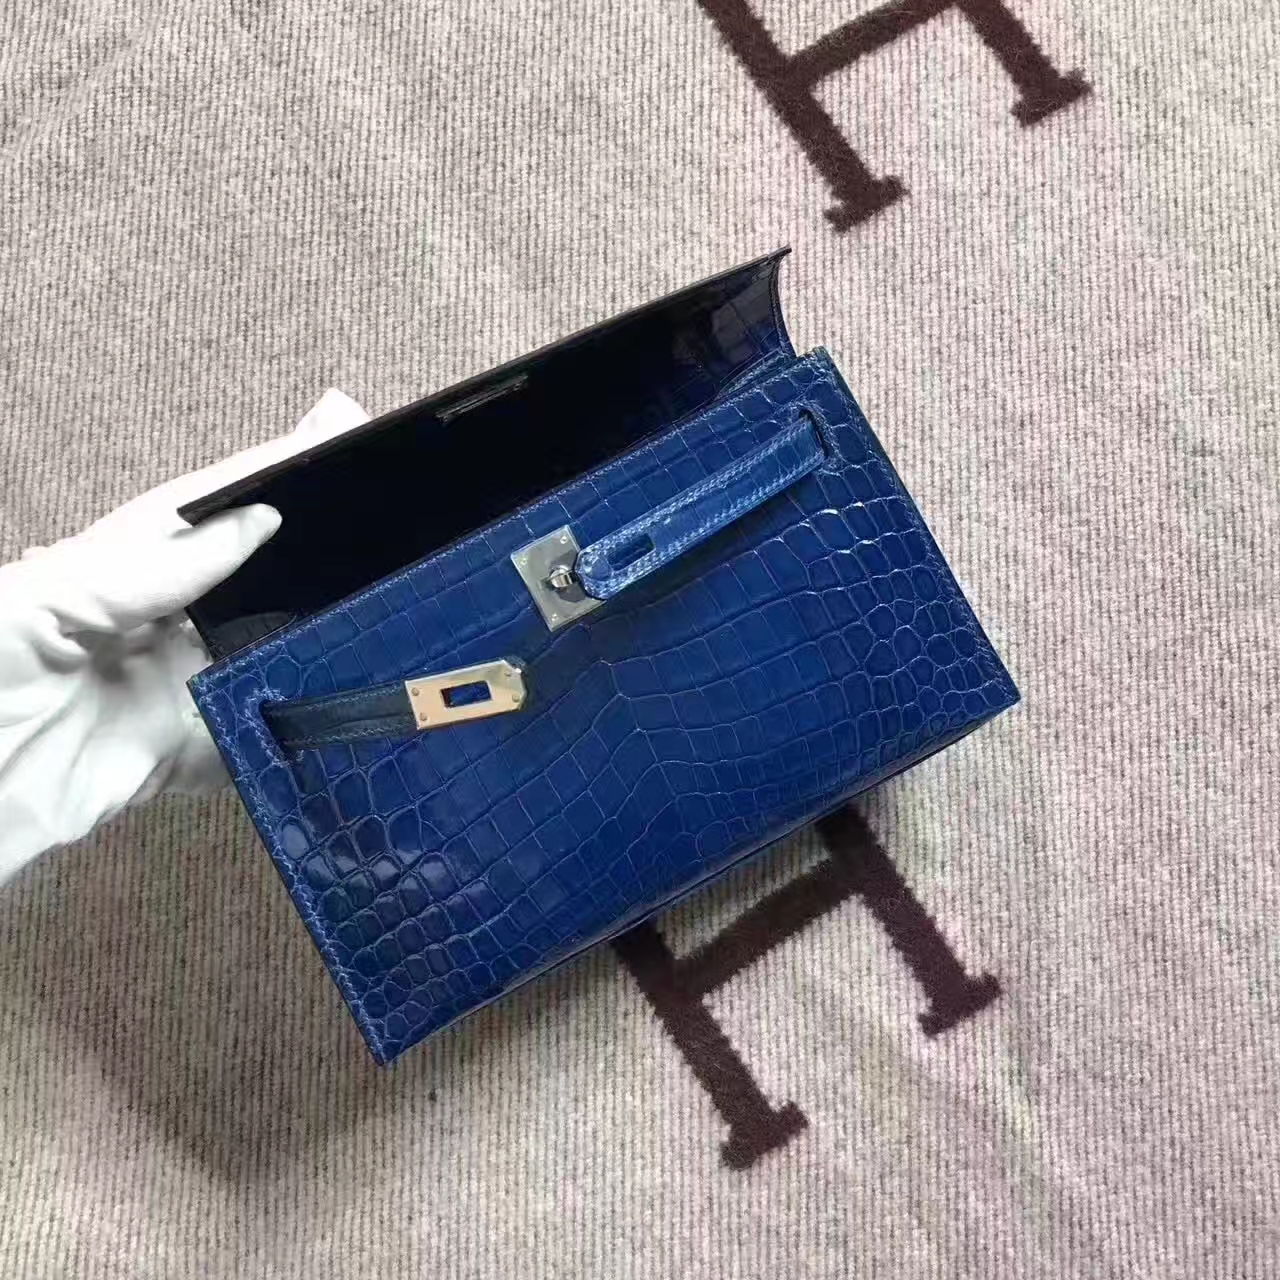 On Sale Hermes Z7 Dark Blue Crocodile Shiny Leather Minikelly Clutch 22CM